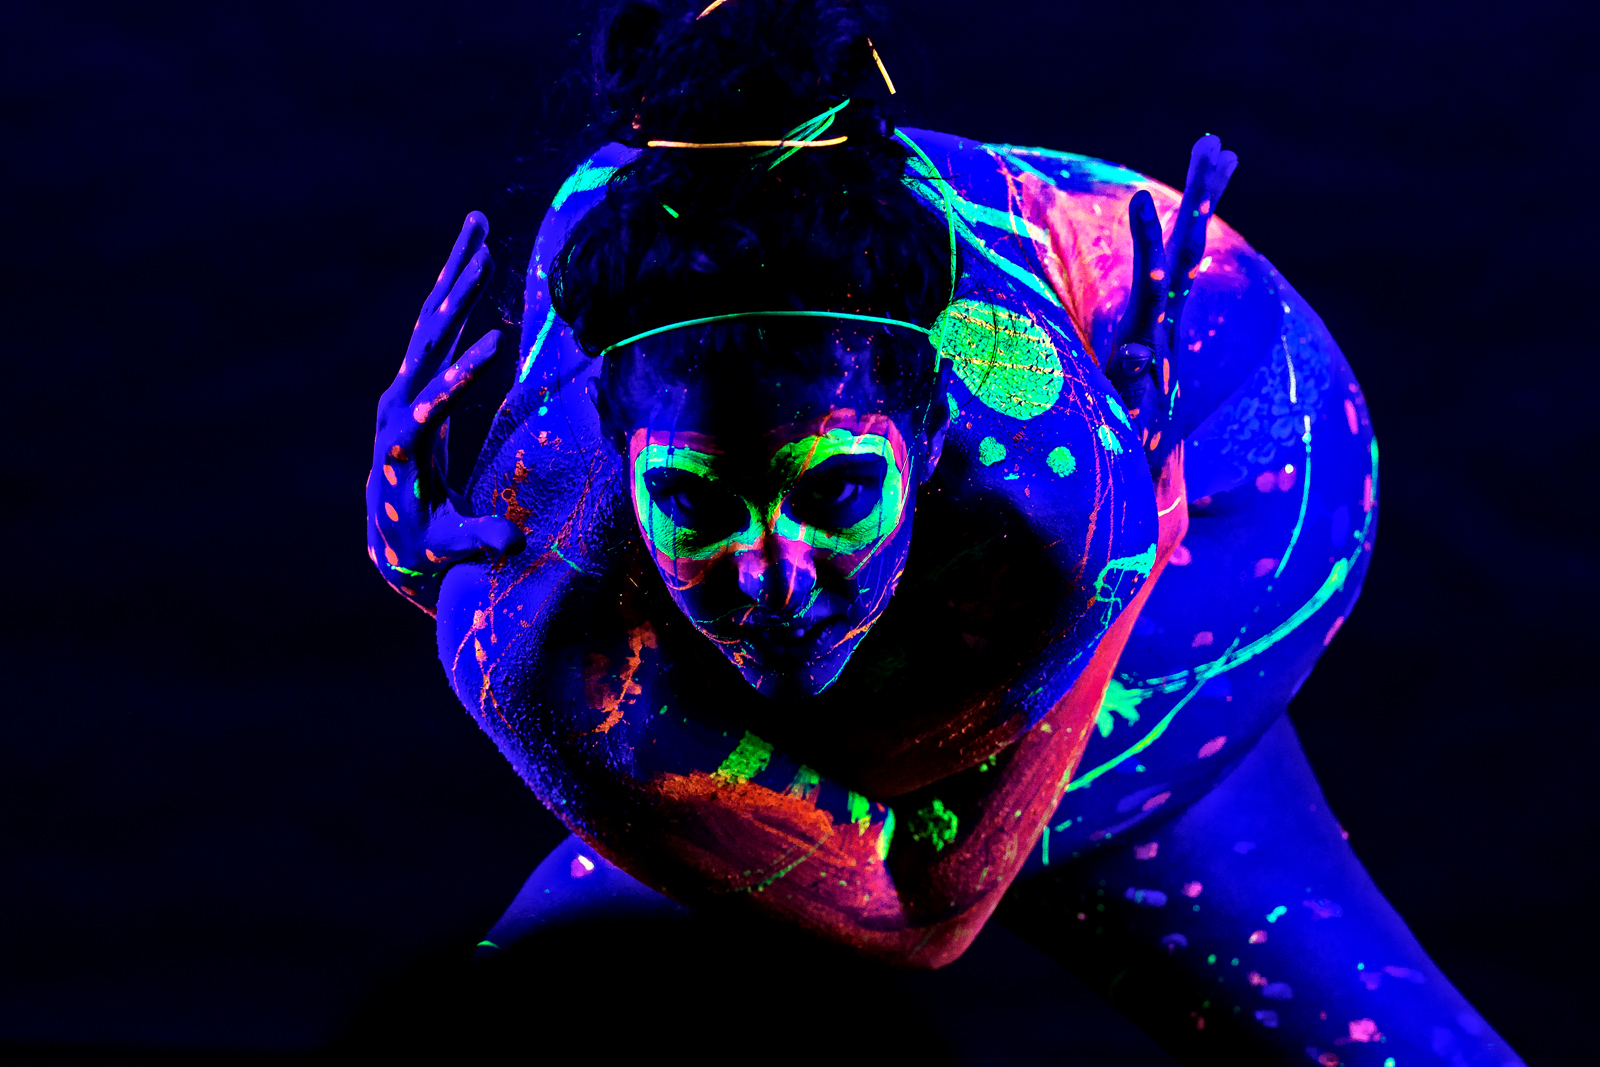 Aggression. Danni Wolf and the Black Light Body Paint. Photographers in Philadelphia. Philadelphia, PA